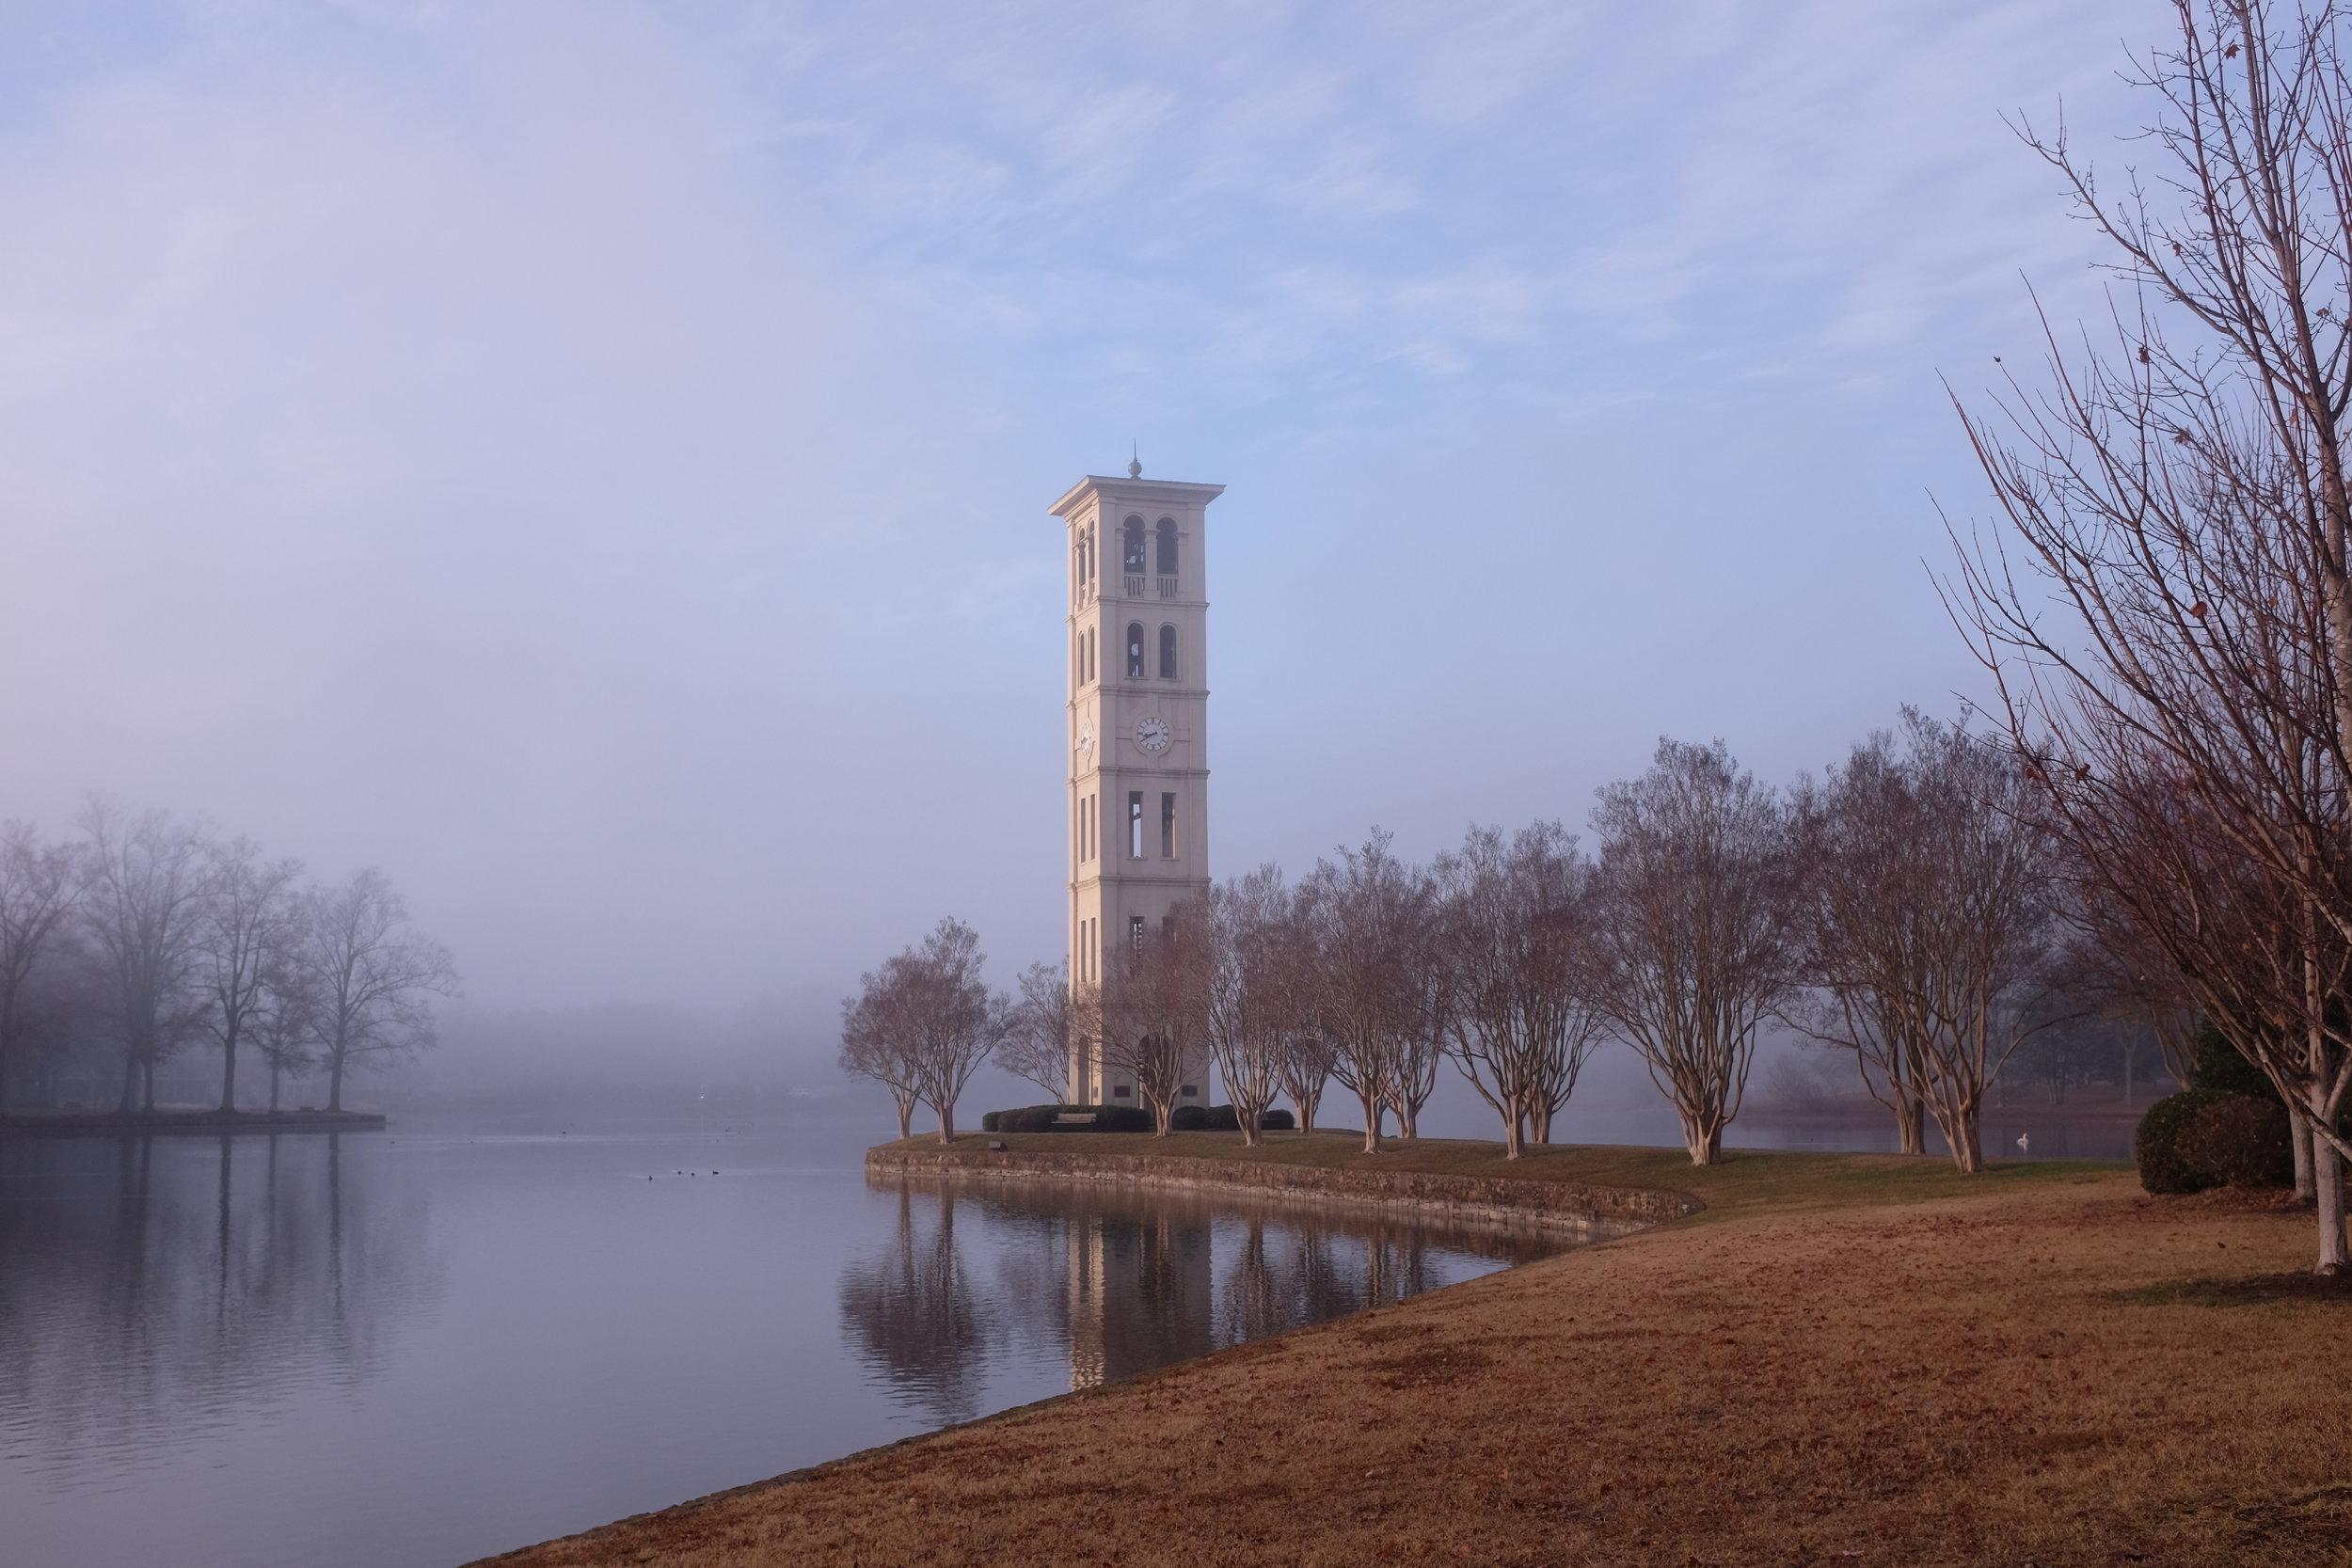 Furman University - Photo by Brittany Hildreth